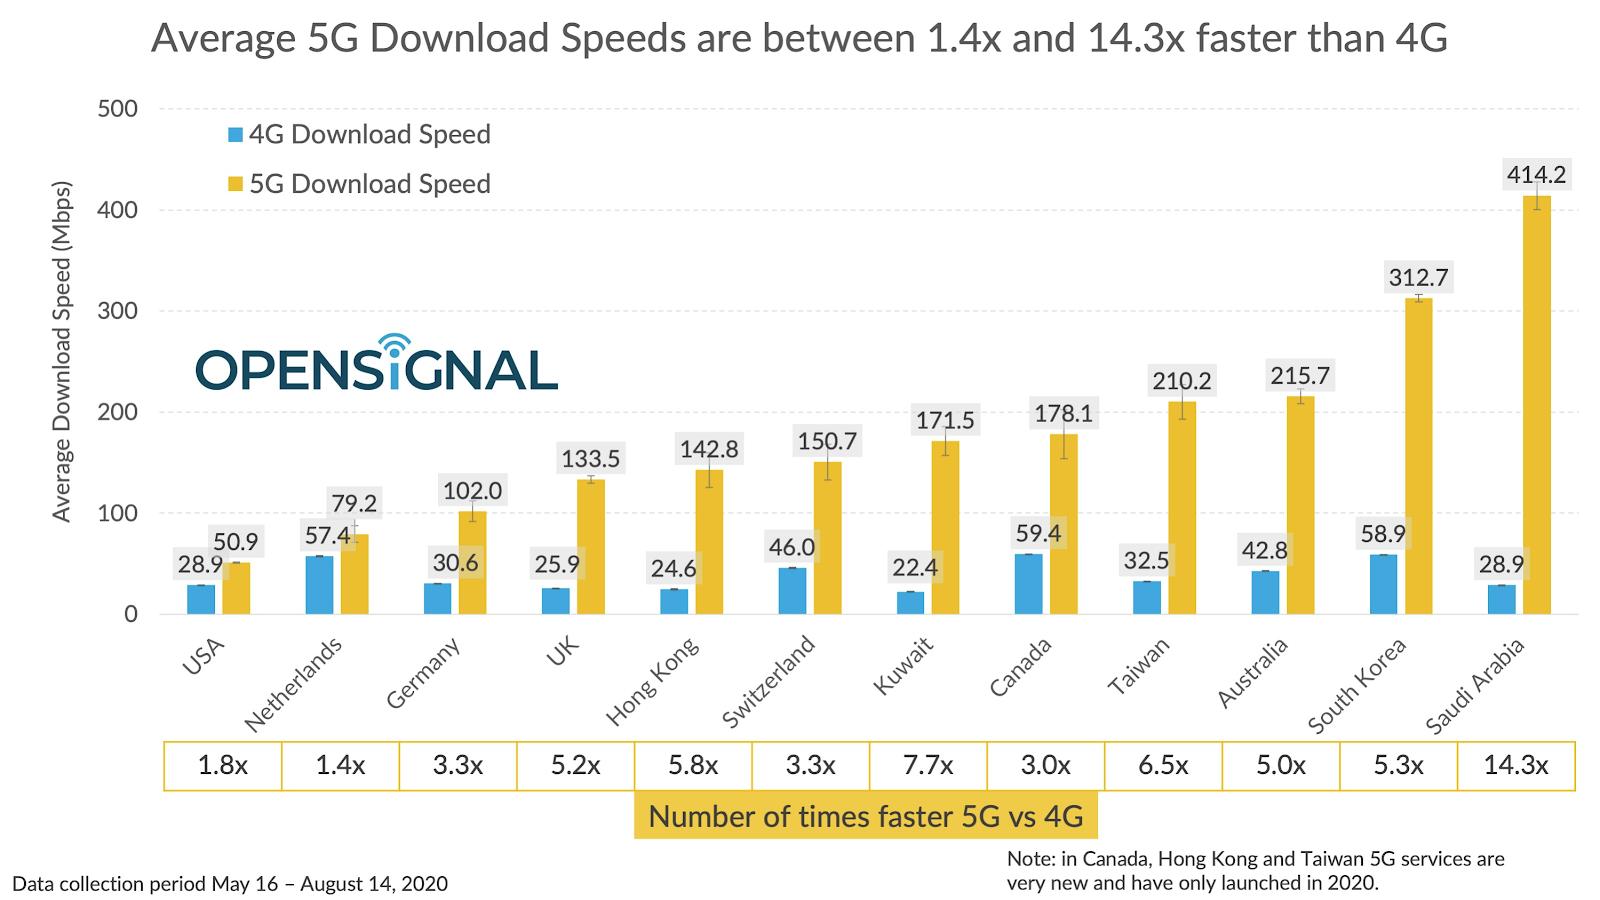 opensignal-5g-vs-4g-speeds-2020